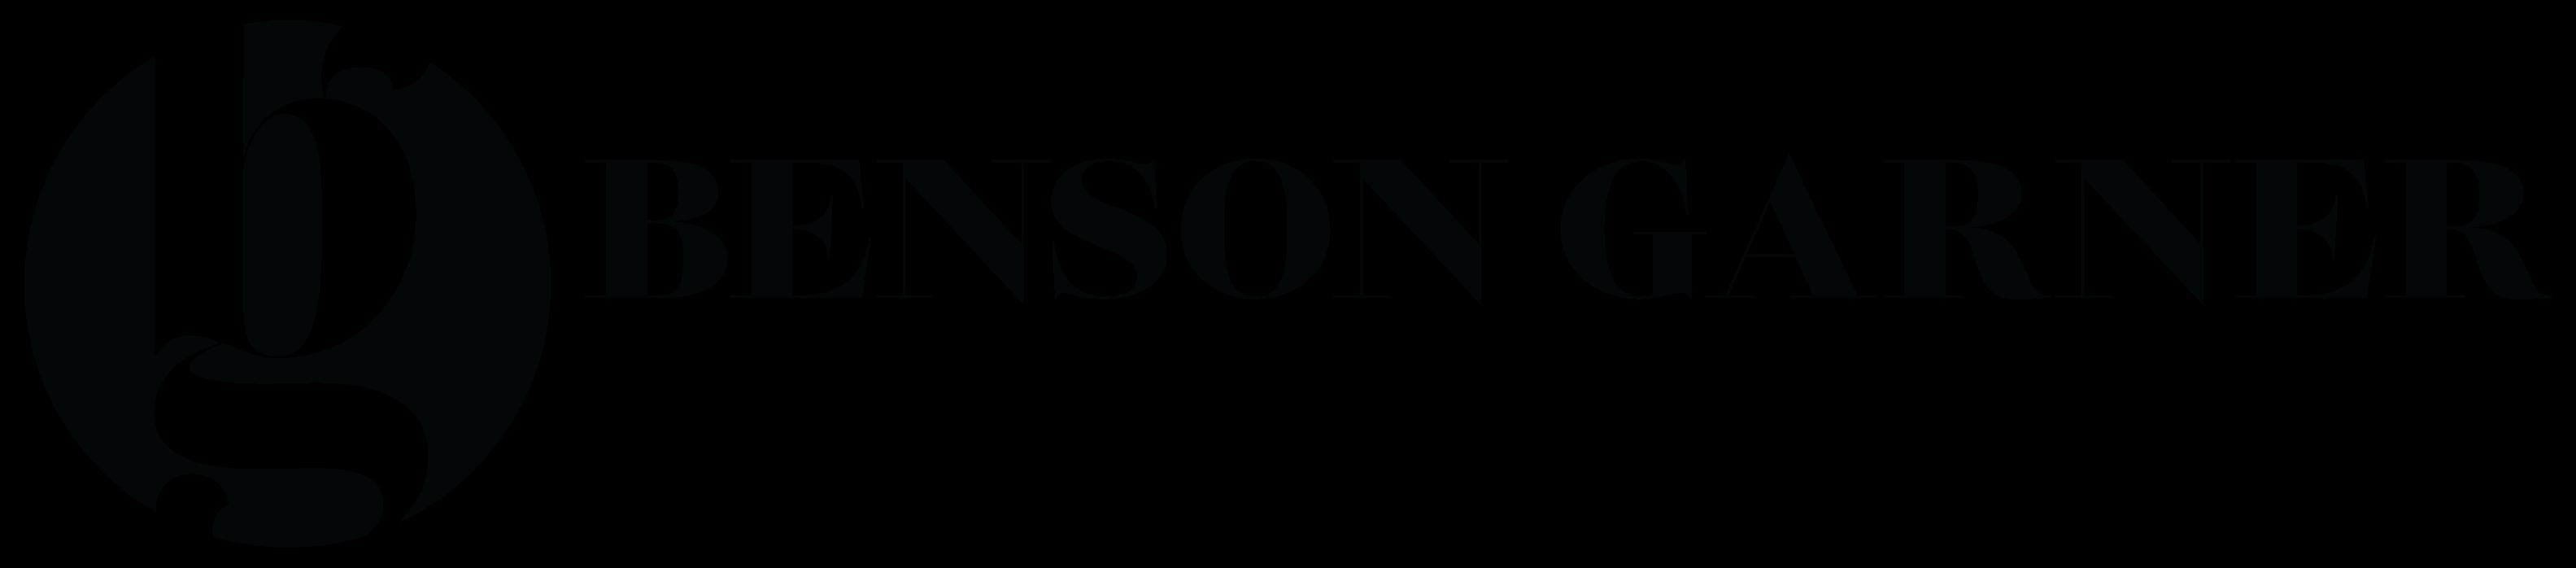 Benson Garner